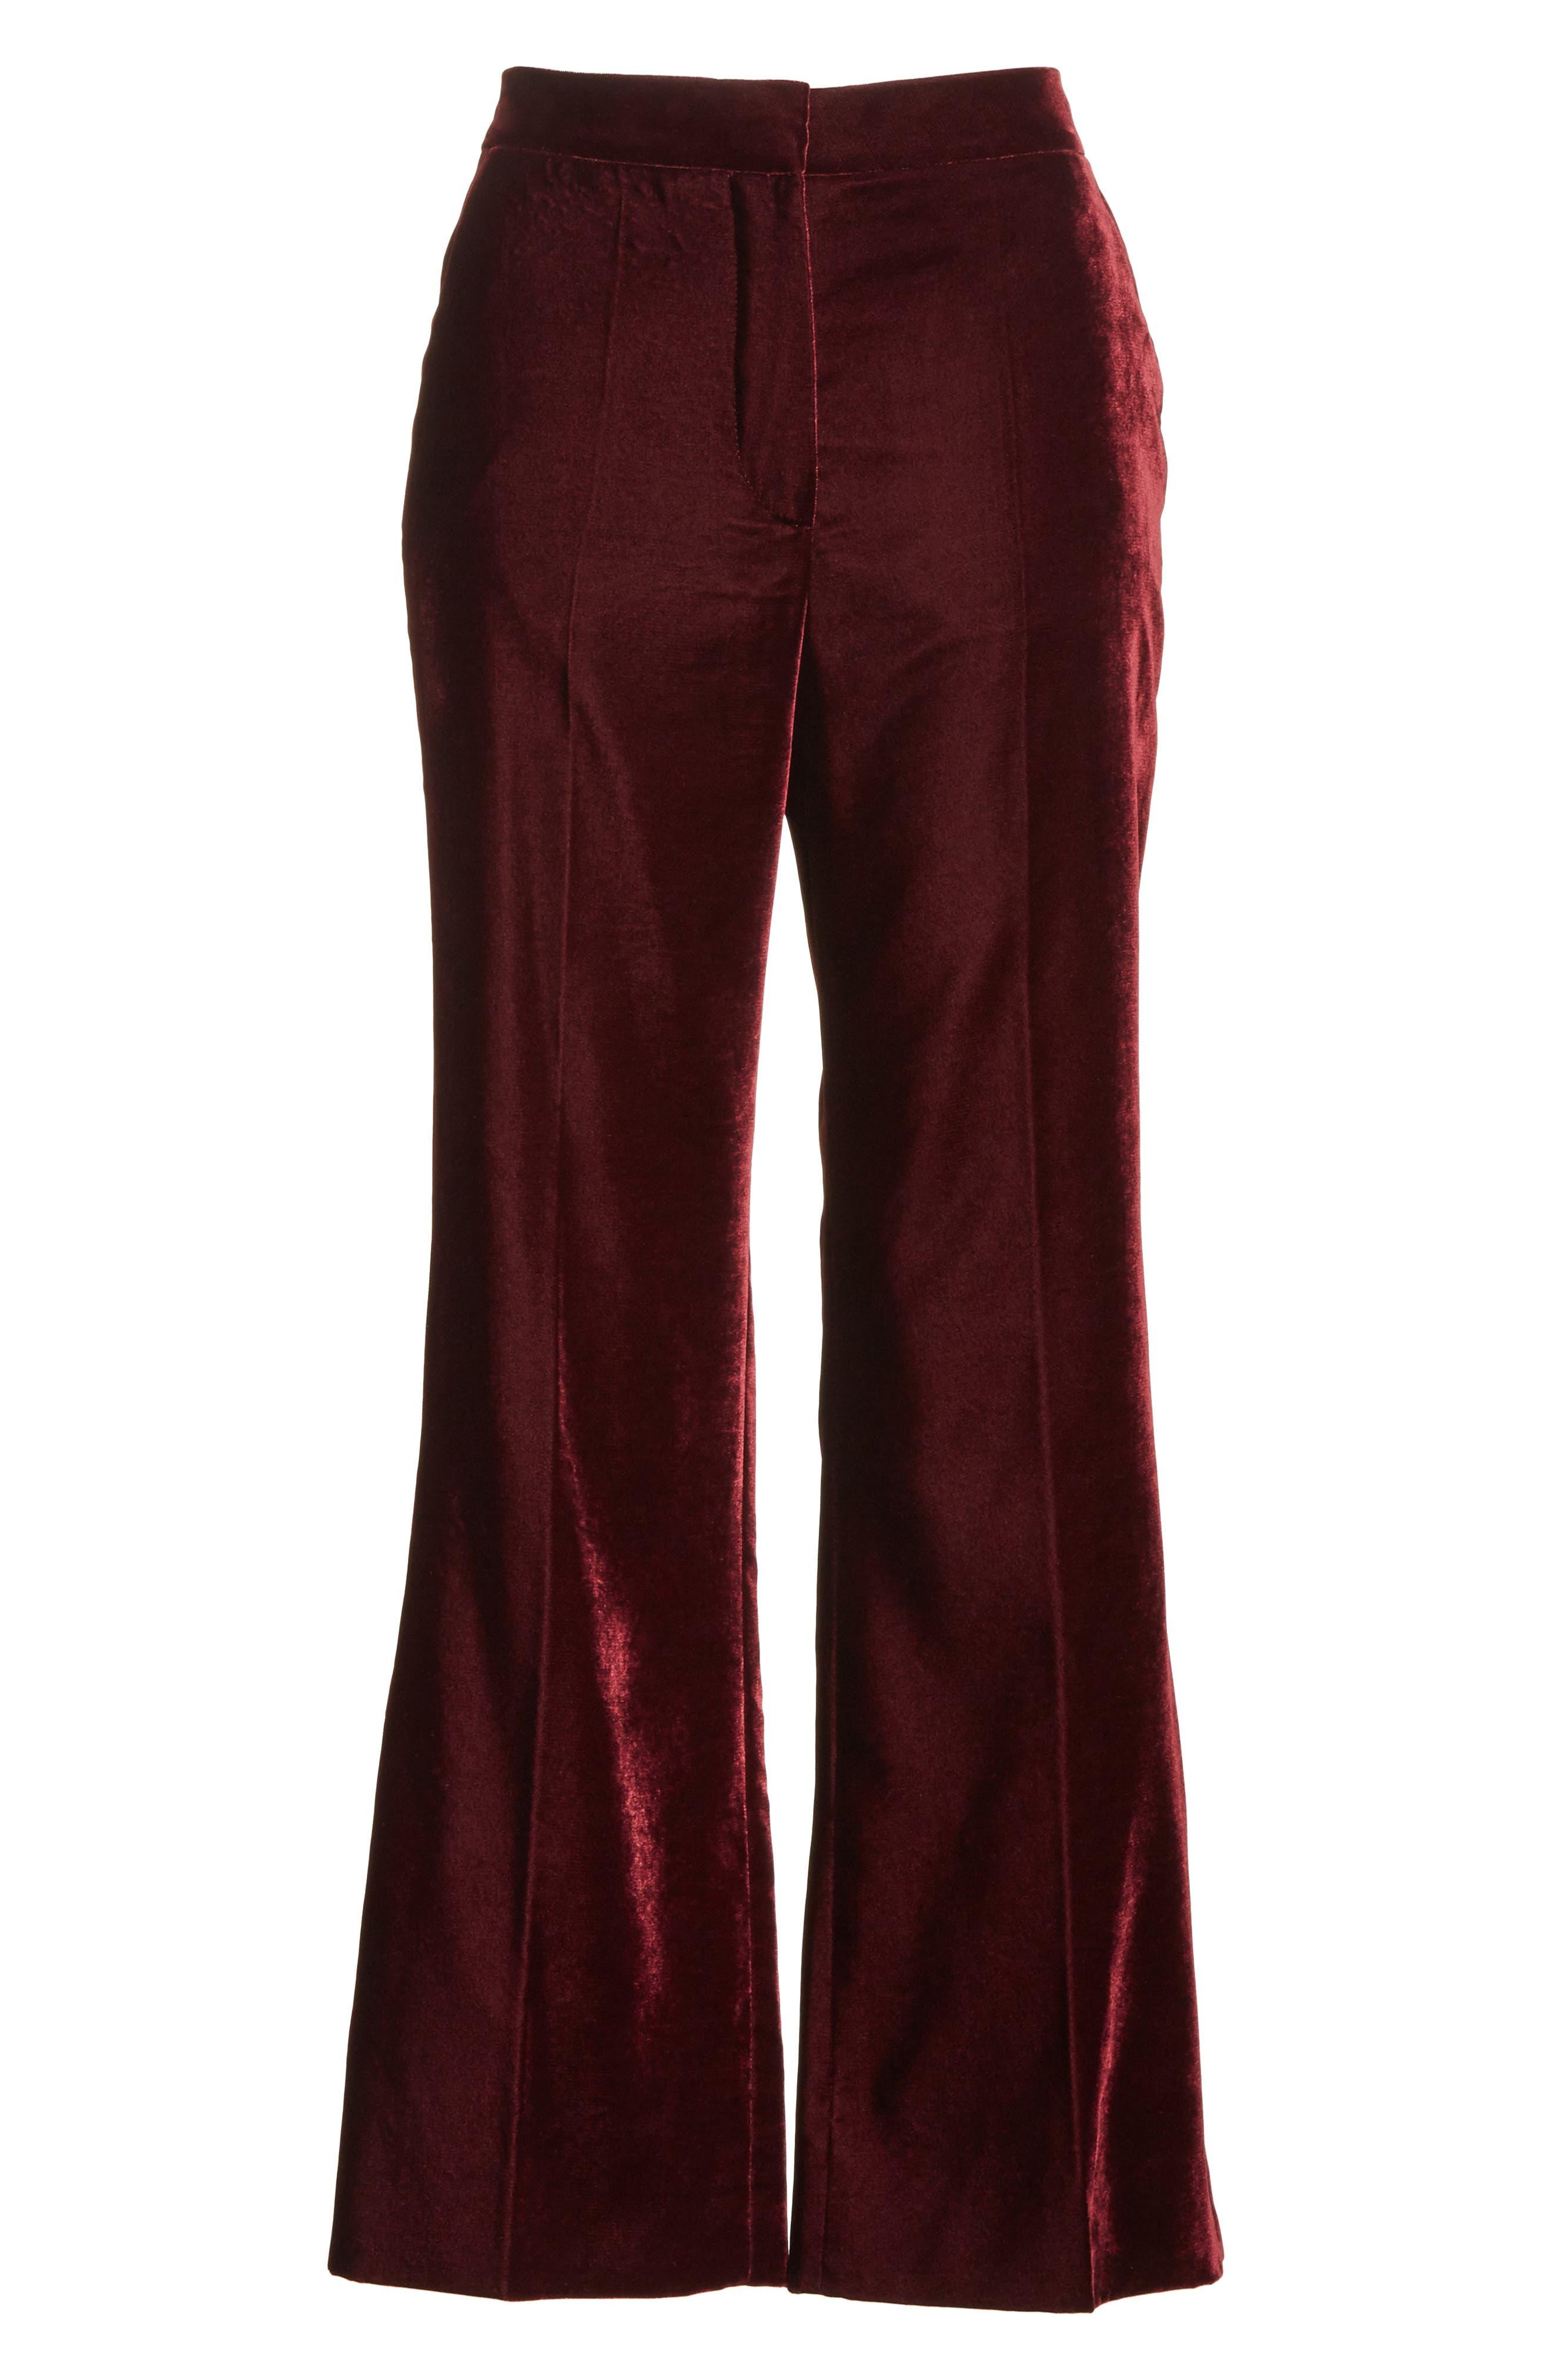 Bonded Velvet Crop Pants,                             Alternate thumbnail 6, color,                             930